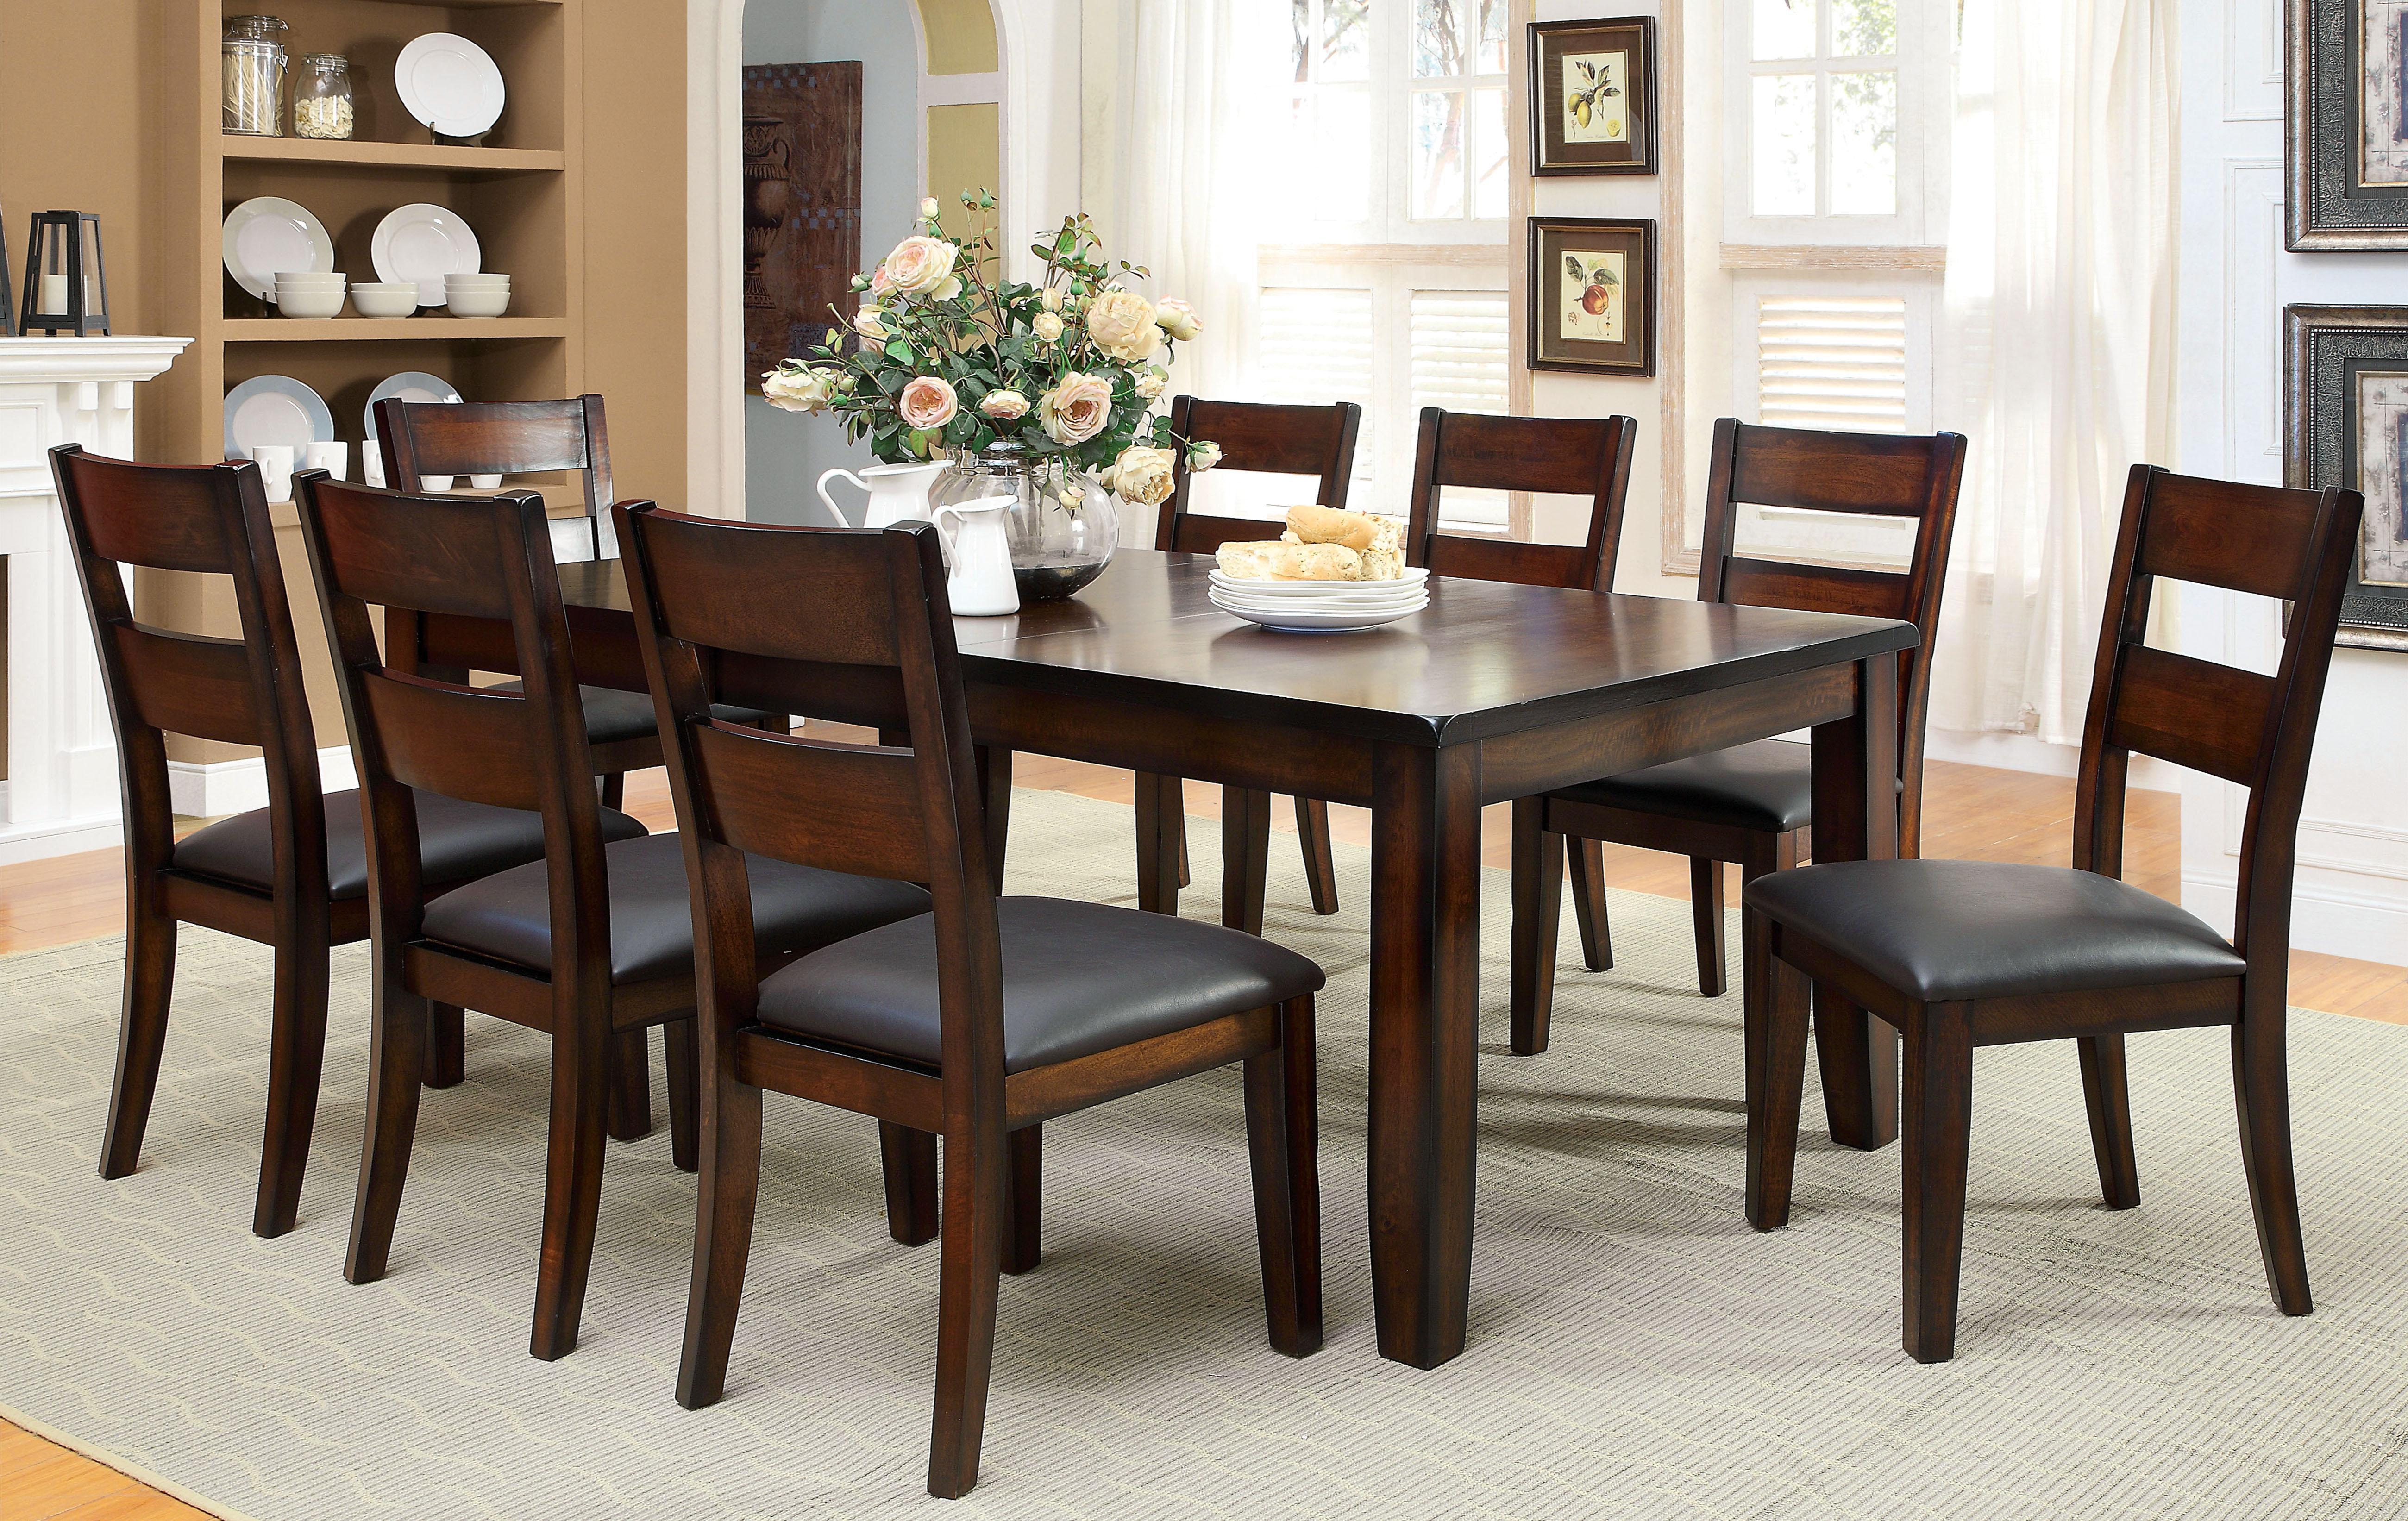 Furniture Of America Kelsie Tapering Leg 9 Piece Dining Table Set